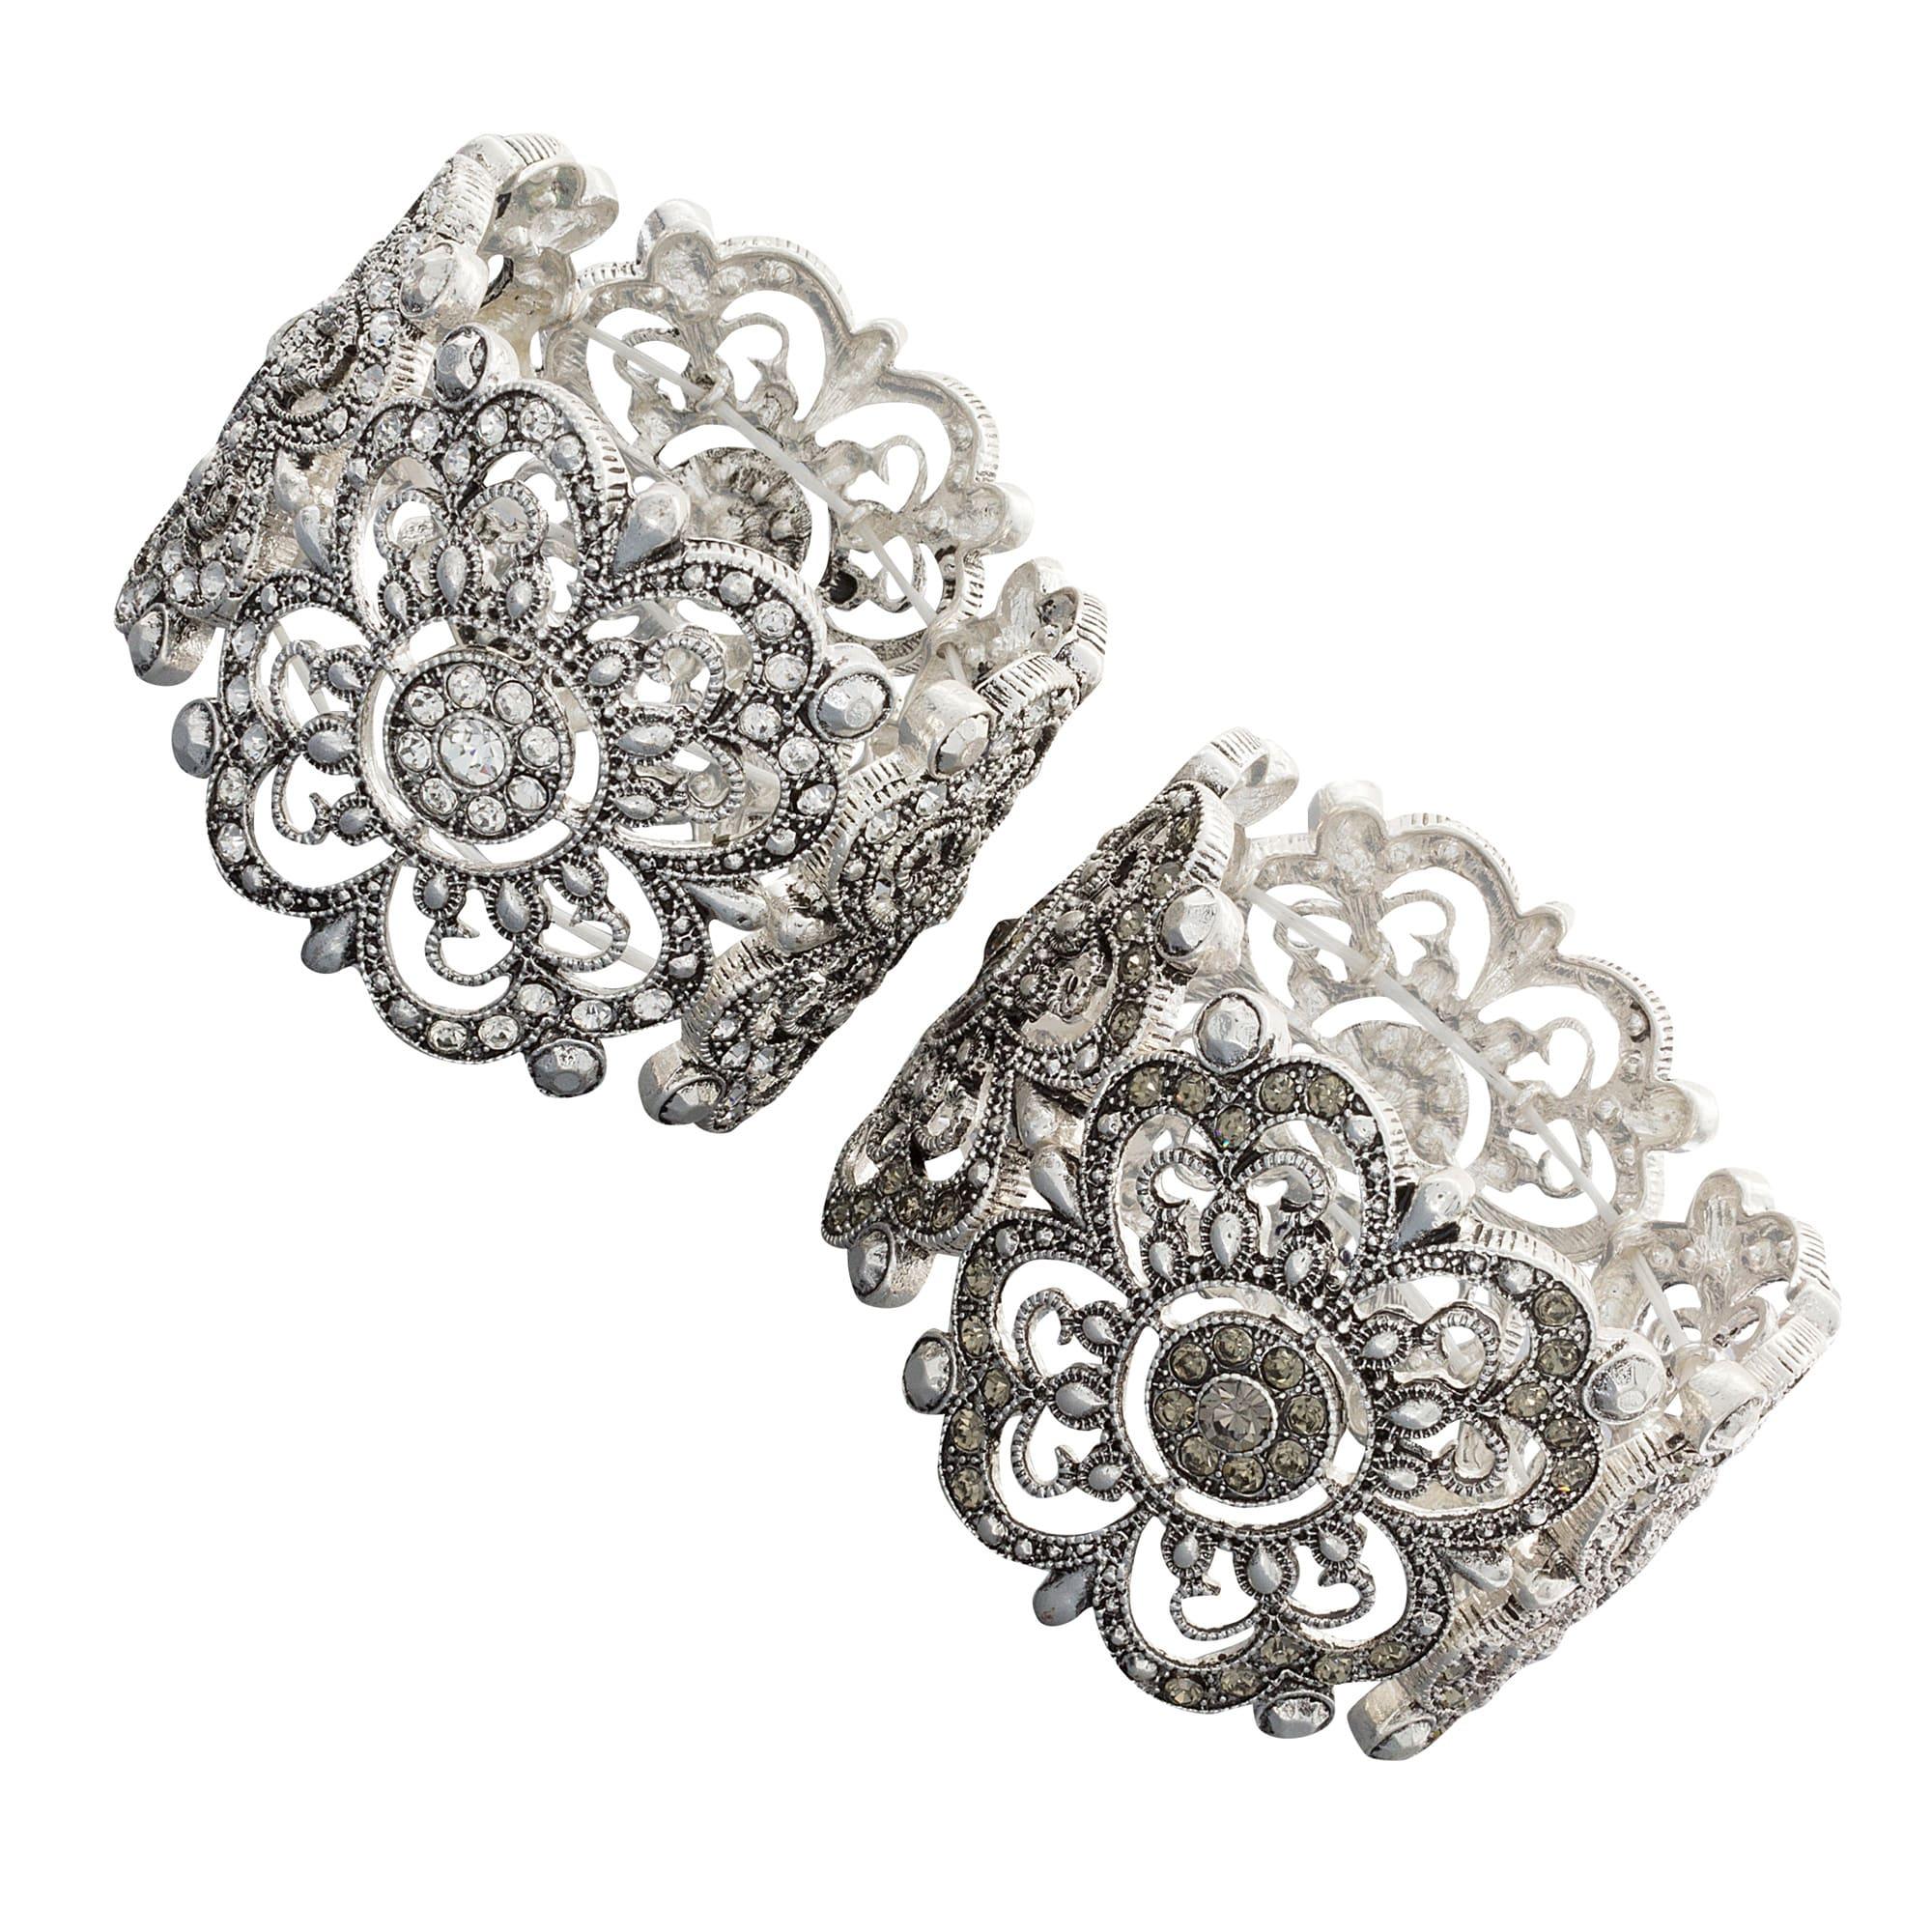 NEXTE Jewelry Silvertone White or Grey Rhinestone Art Deco Vintage-style Bracelet